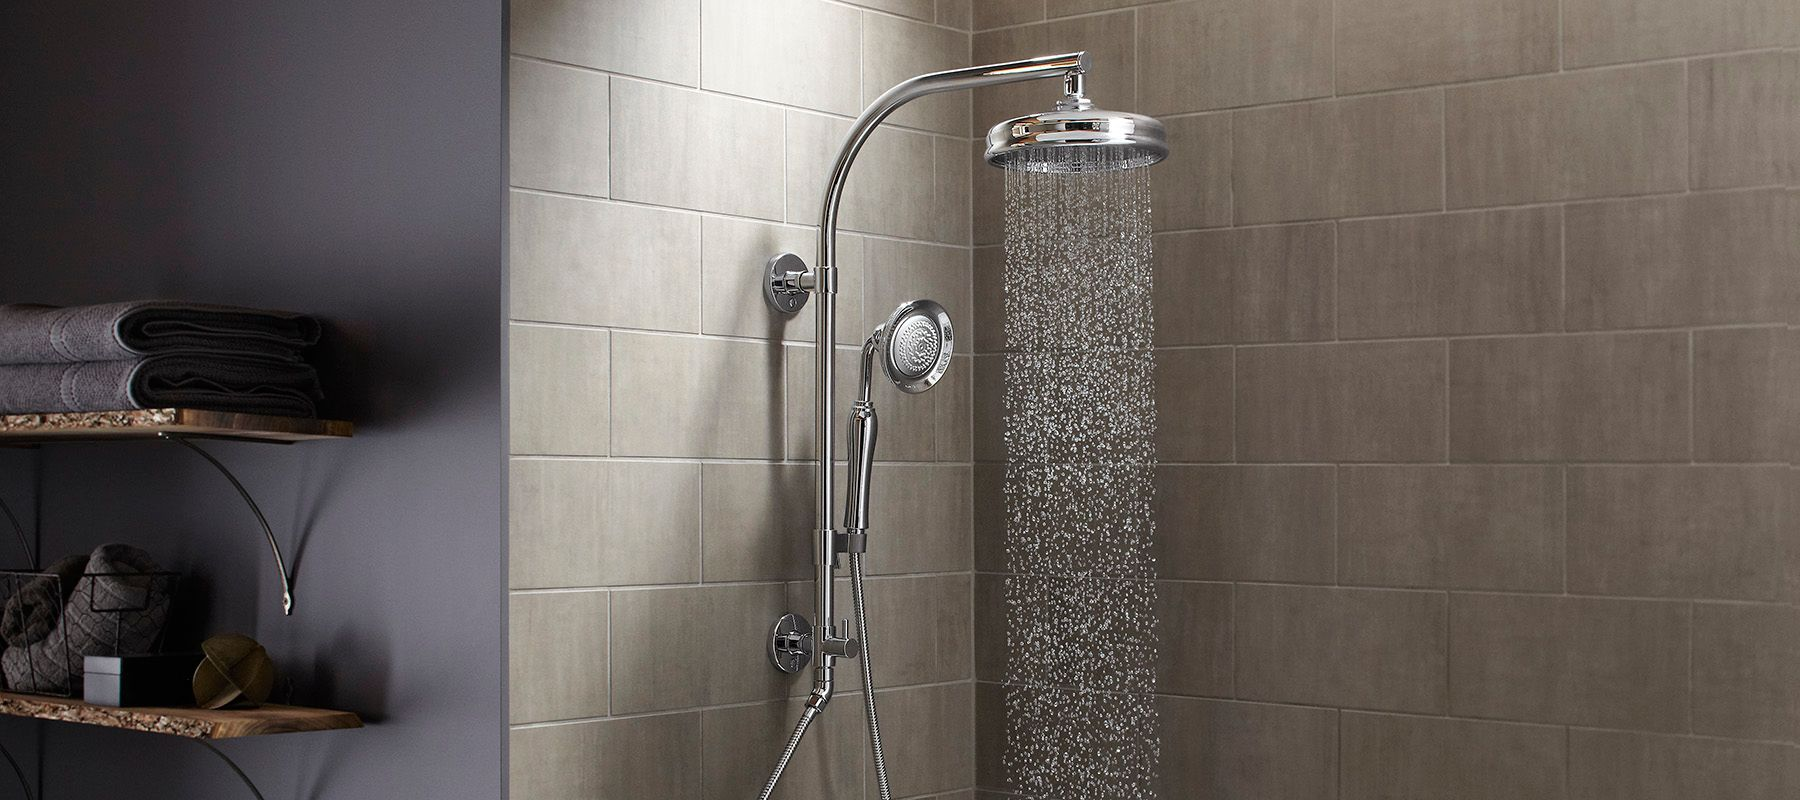 Home Depot Showers